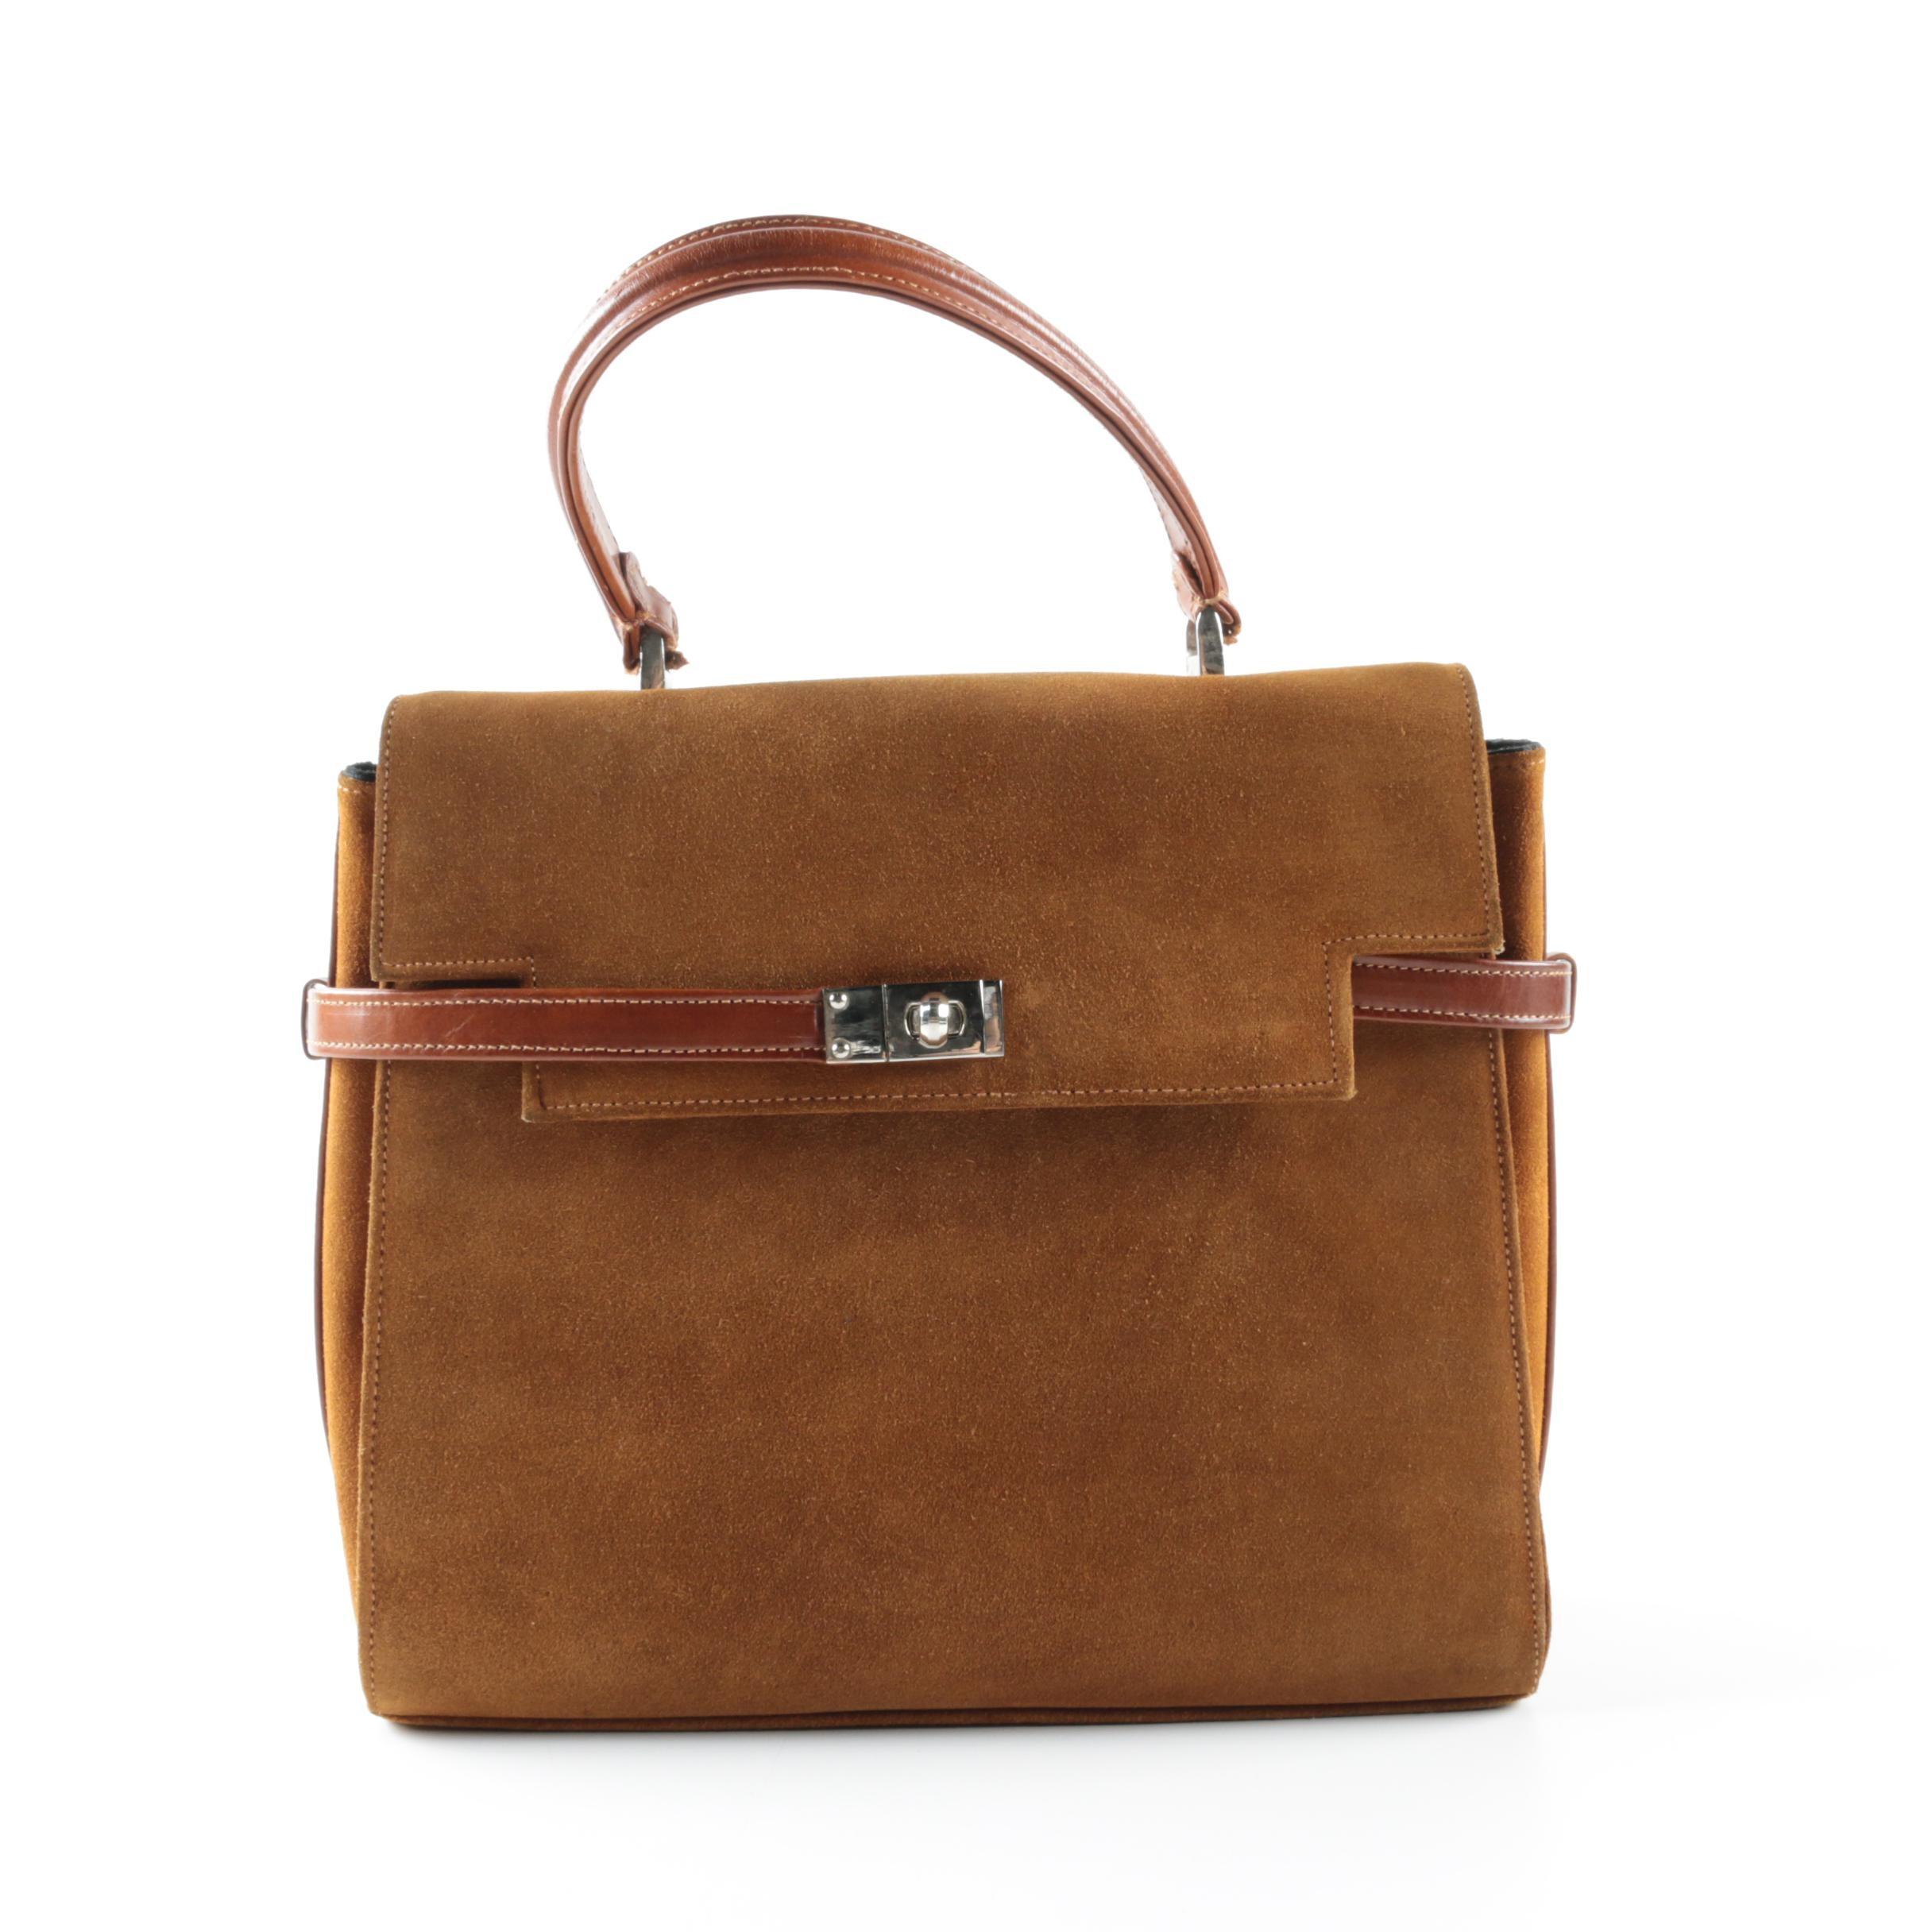 Vintage Suede and Leather Handbag